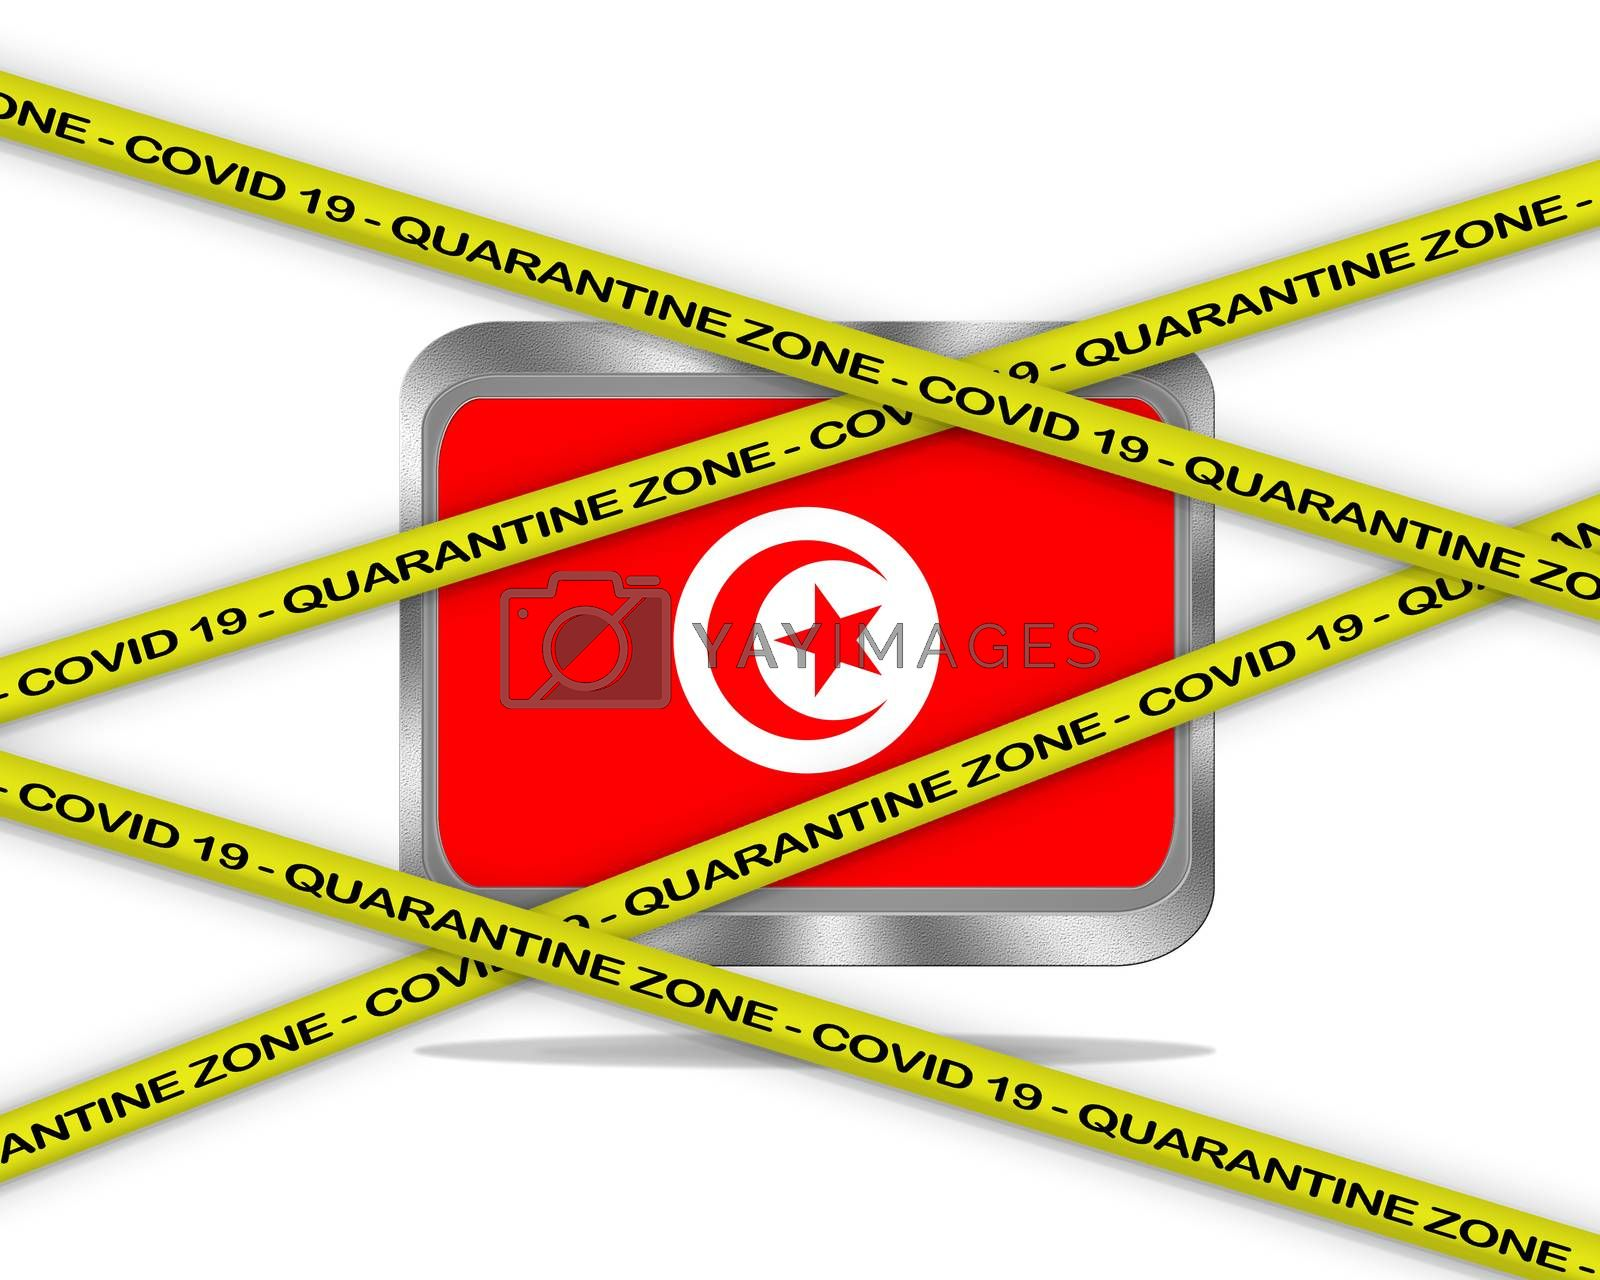 COVID-19 warning yellow ribbon written with: Quarantine zone Cover 19 on Tunisia flag illustration. Coronavirus danger area, quarantined country.